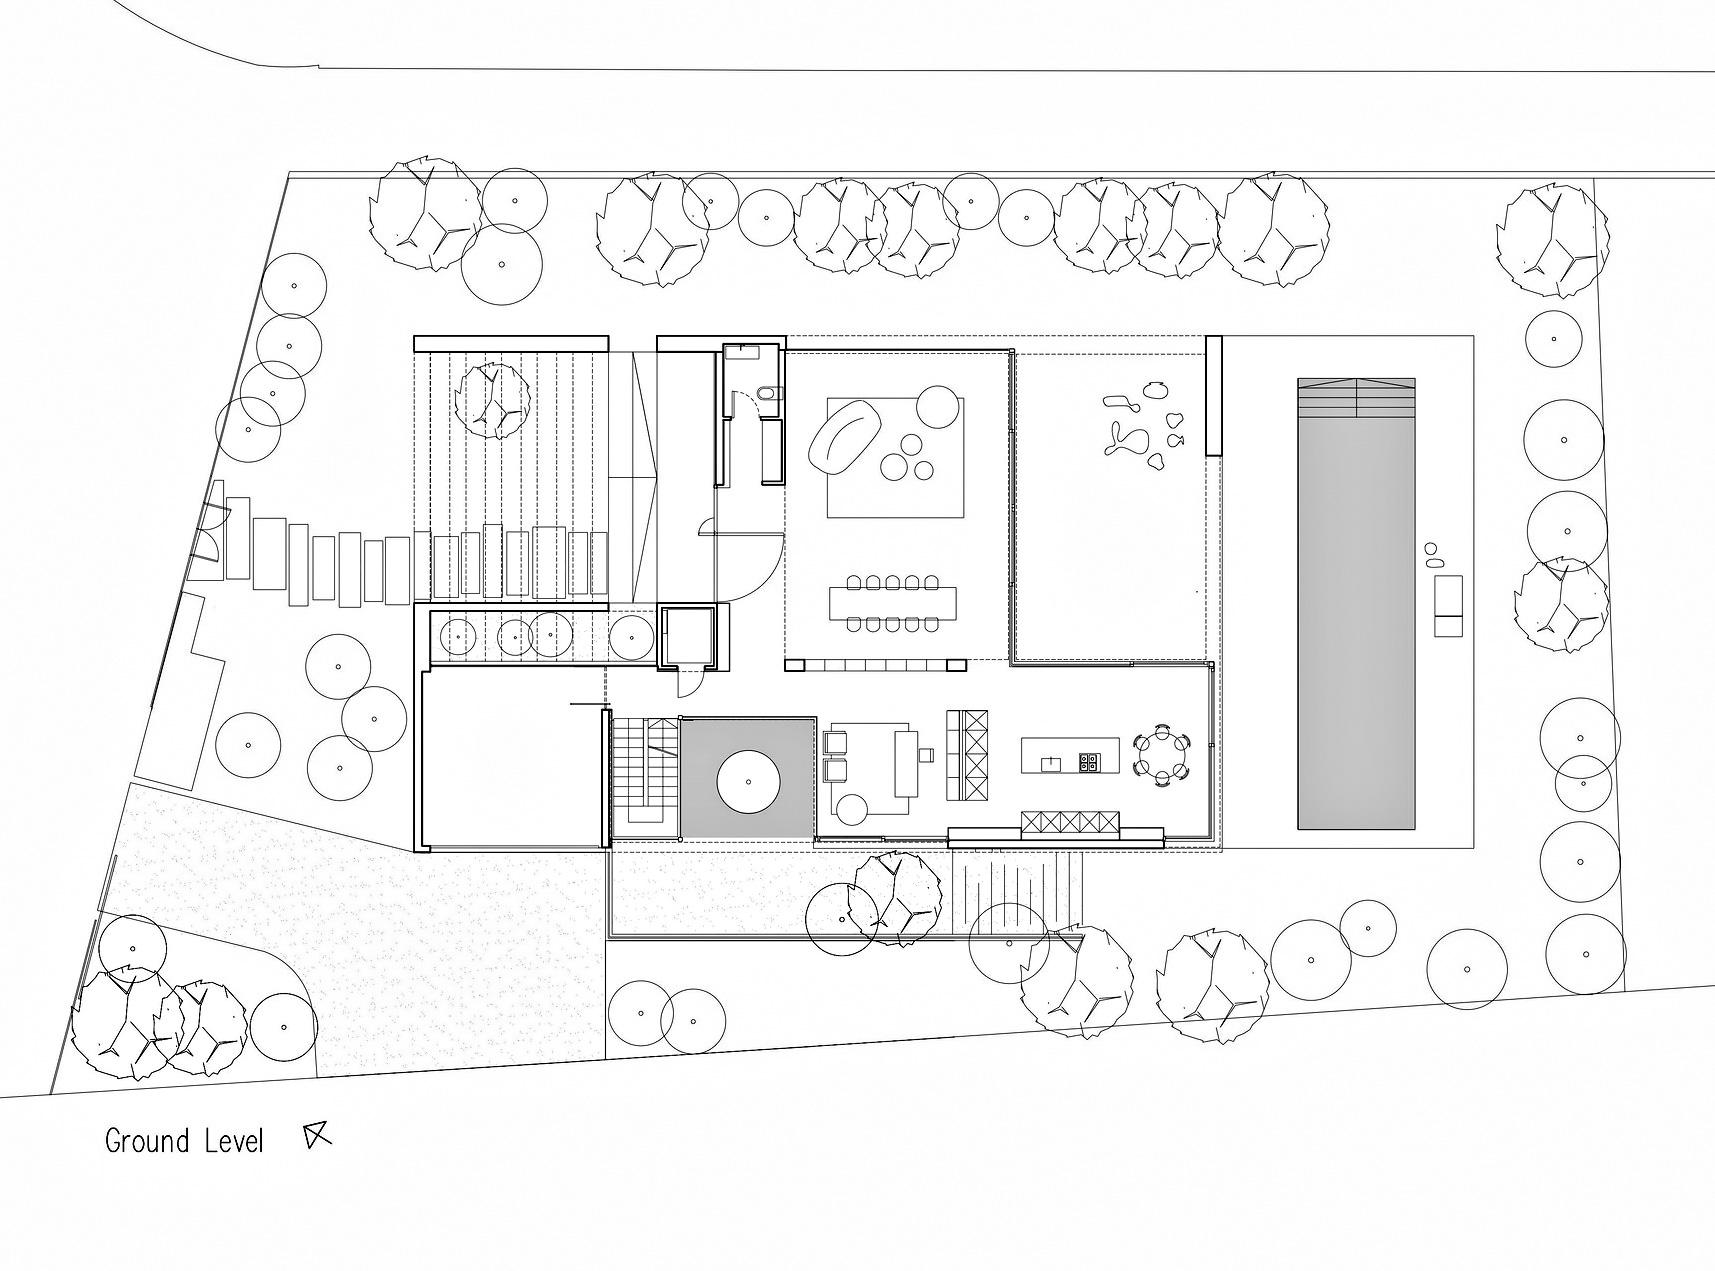 Ground Level Floor Plan - Corten House Luxury Residence - Savyon, Tel Aviv, Israel